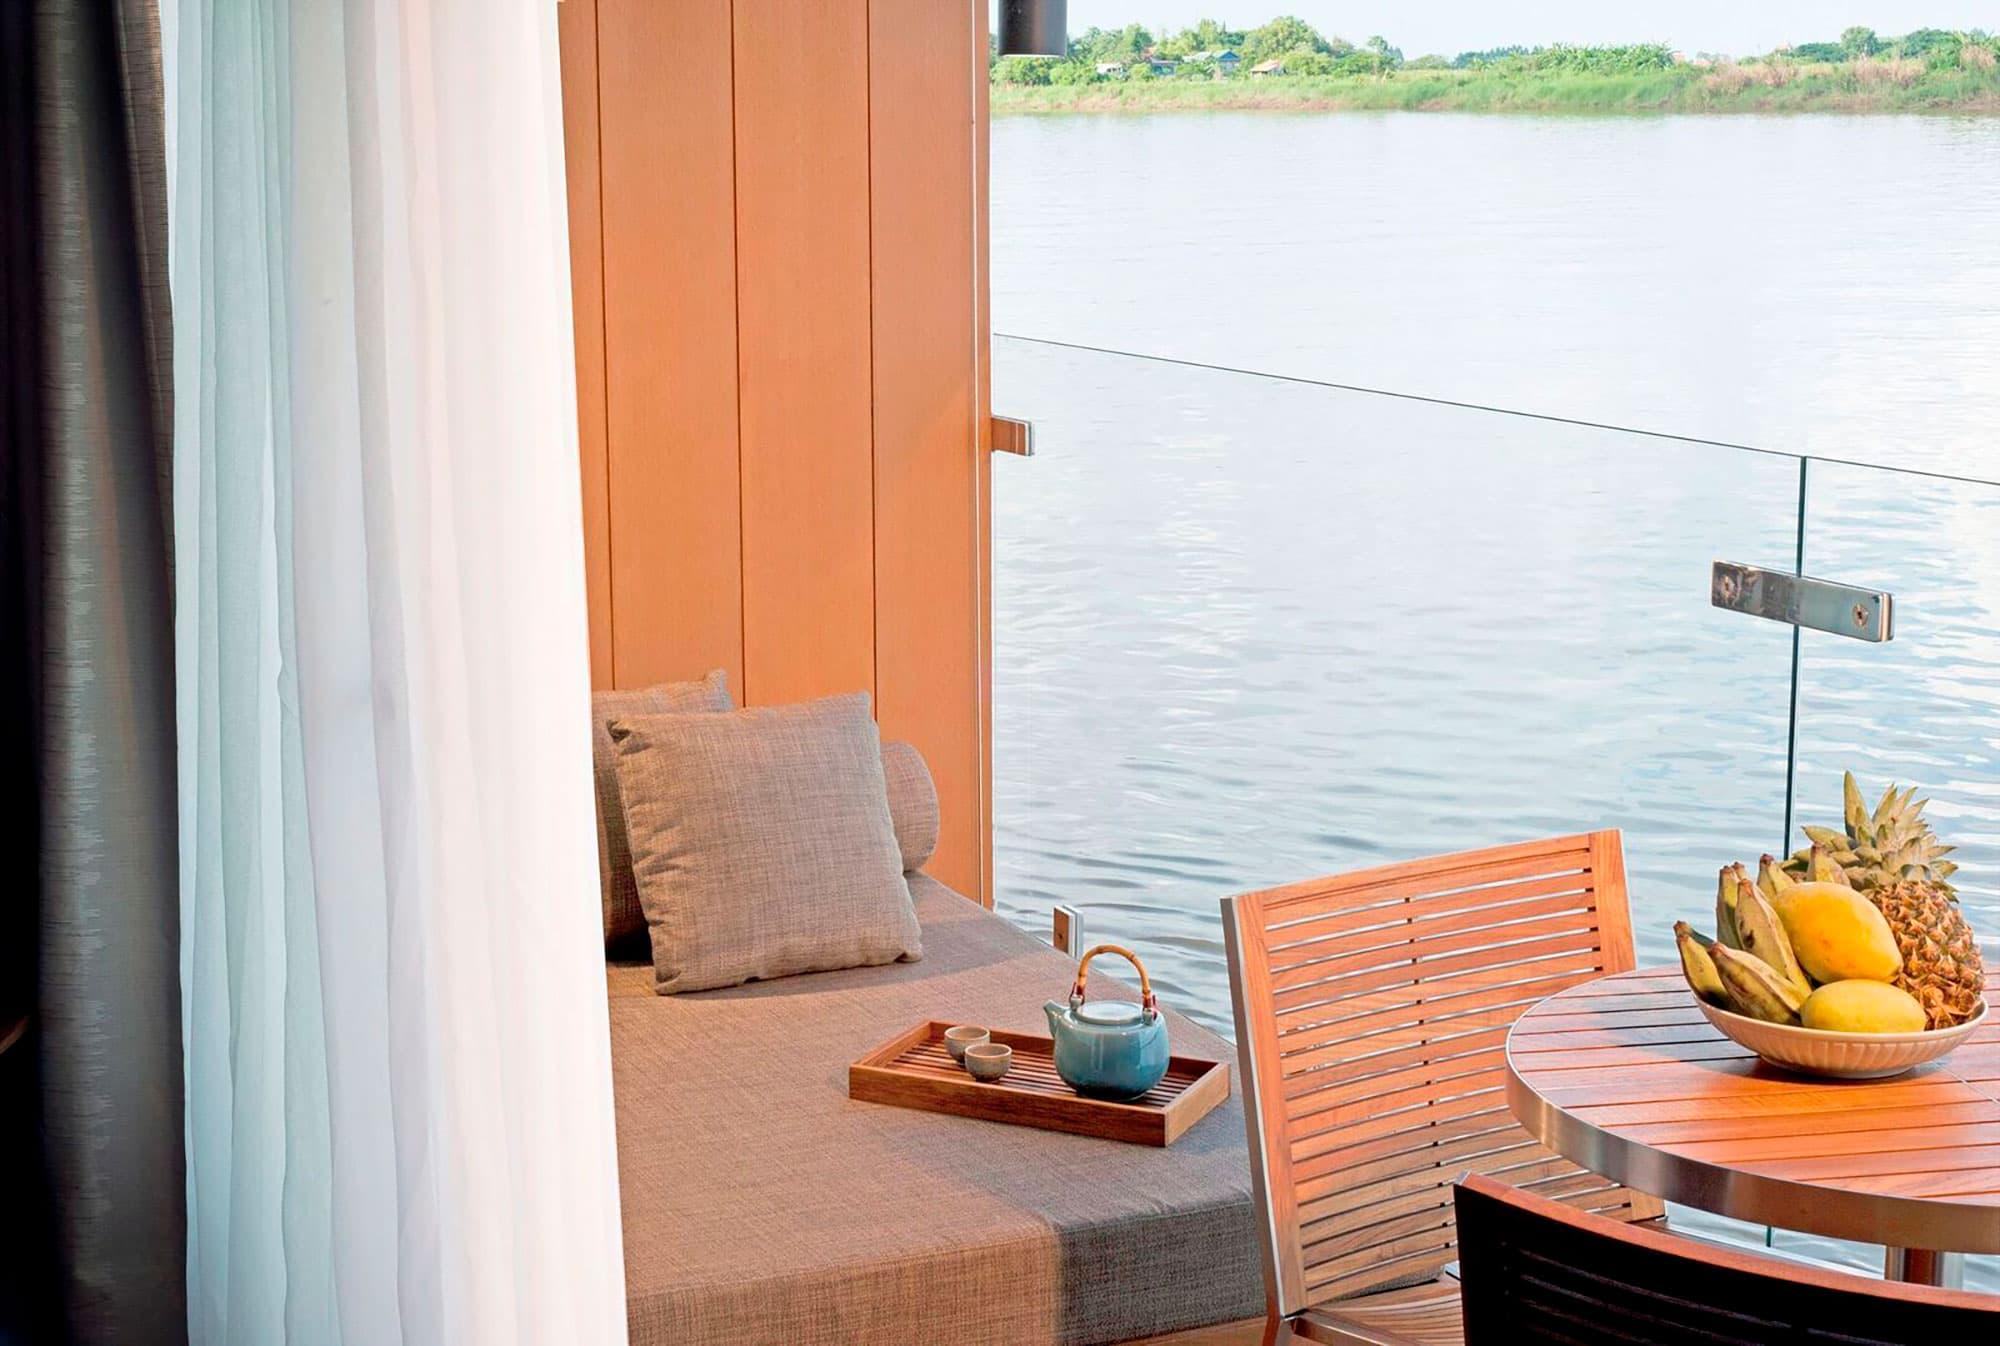 Crucero AQUA de 4 noches – Río arriba – Temporada de Agua Alta (De Ho Chi Minh a Phnom Penh) - Vietnam- imagen #3